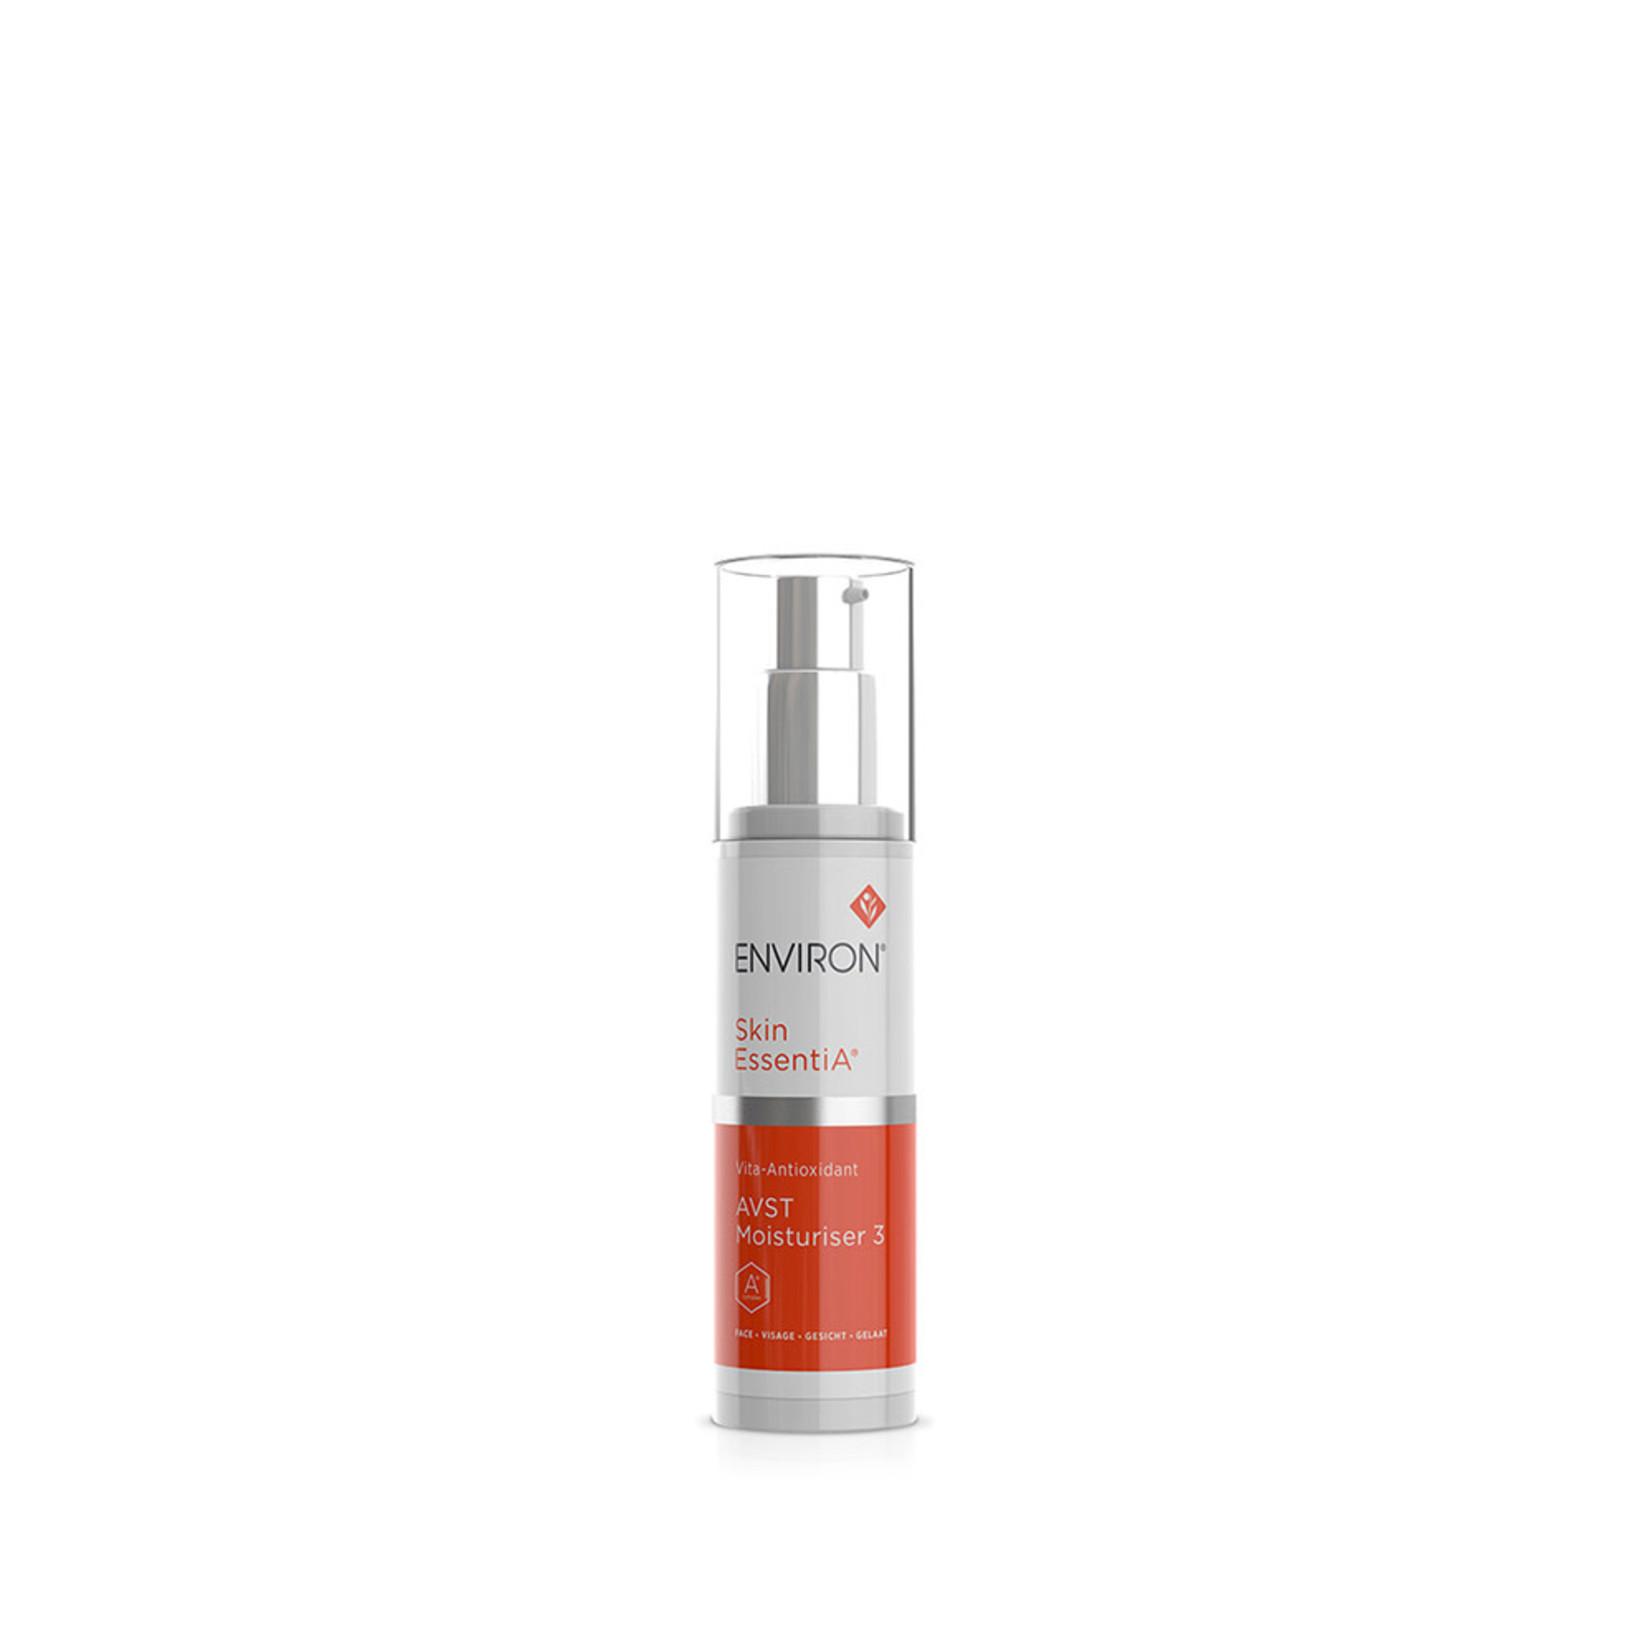 Environ Vita-antioxidant AVST Moisturiser 3 -50ml